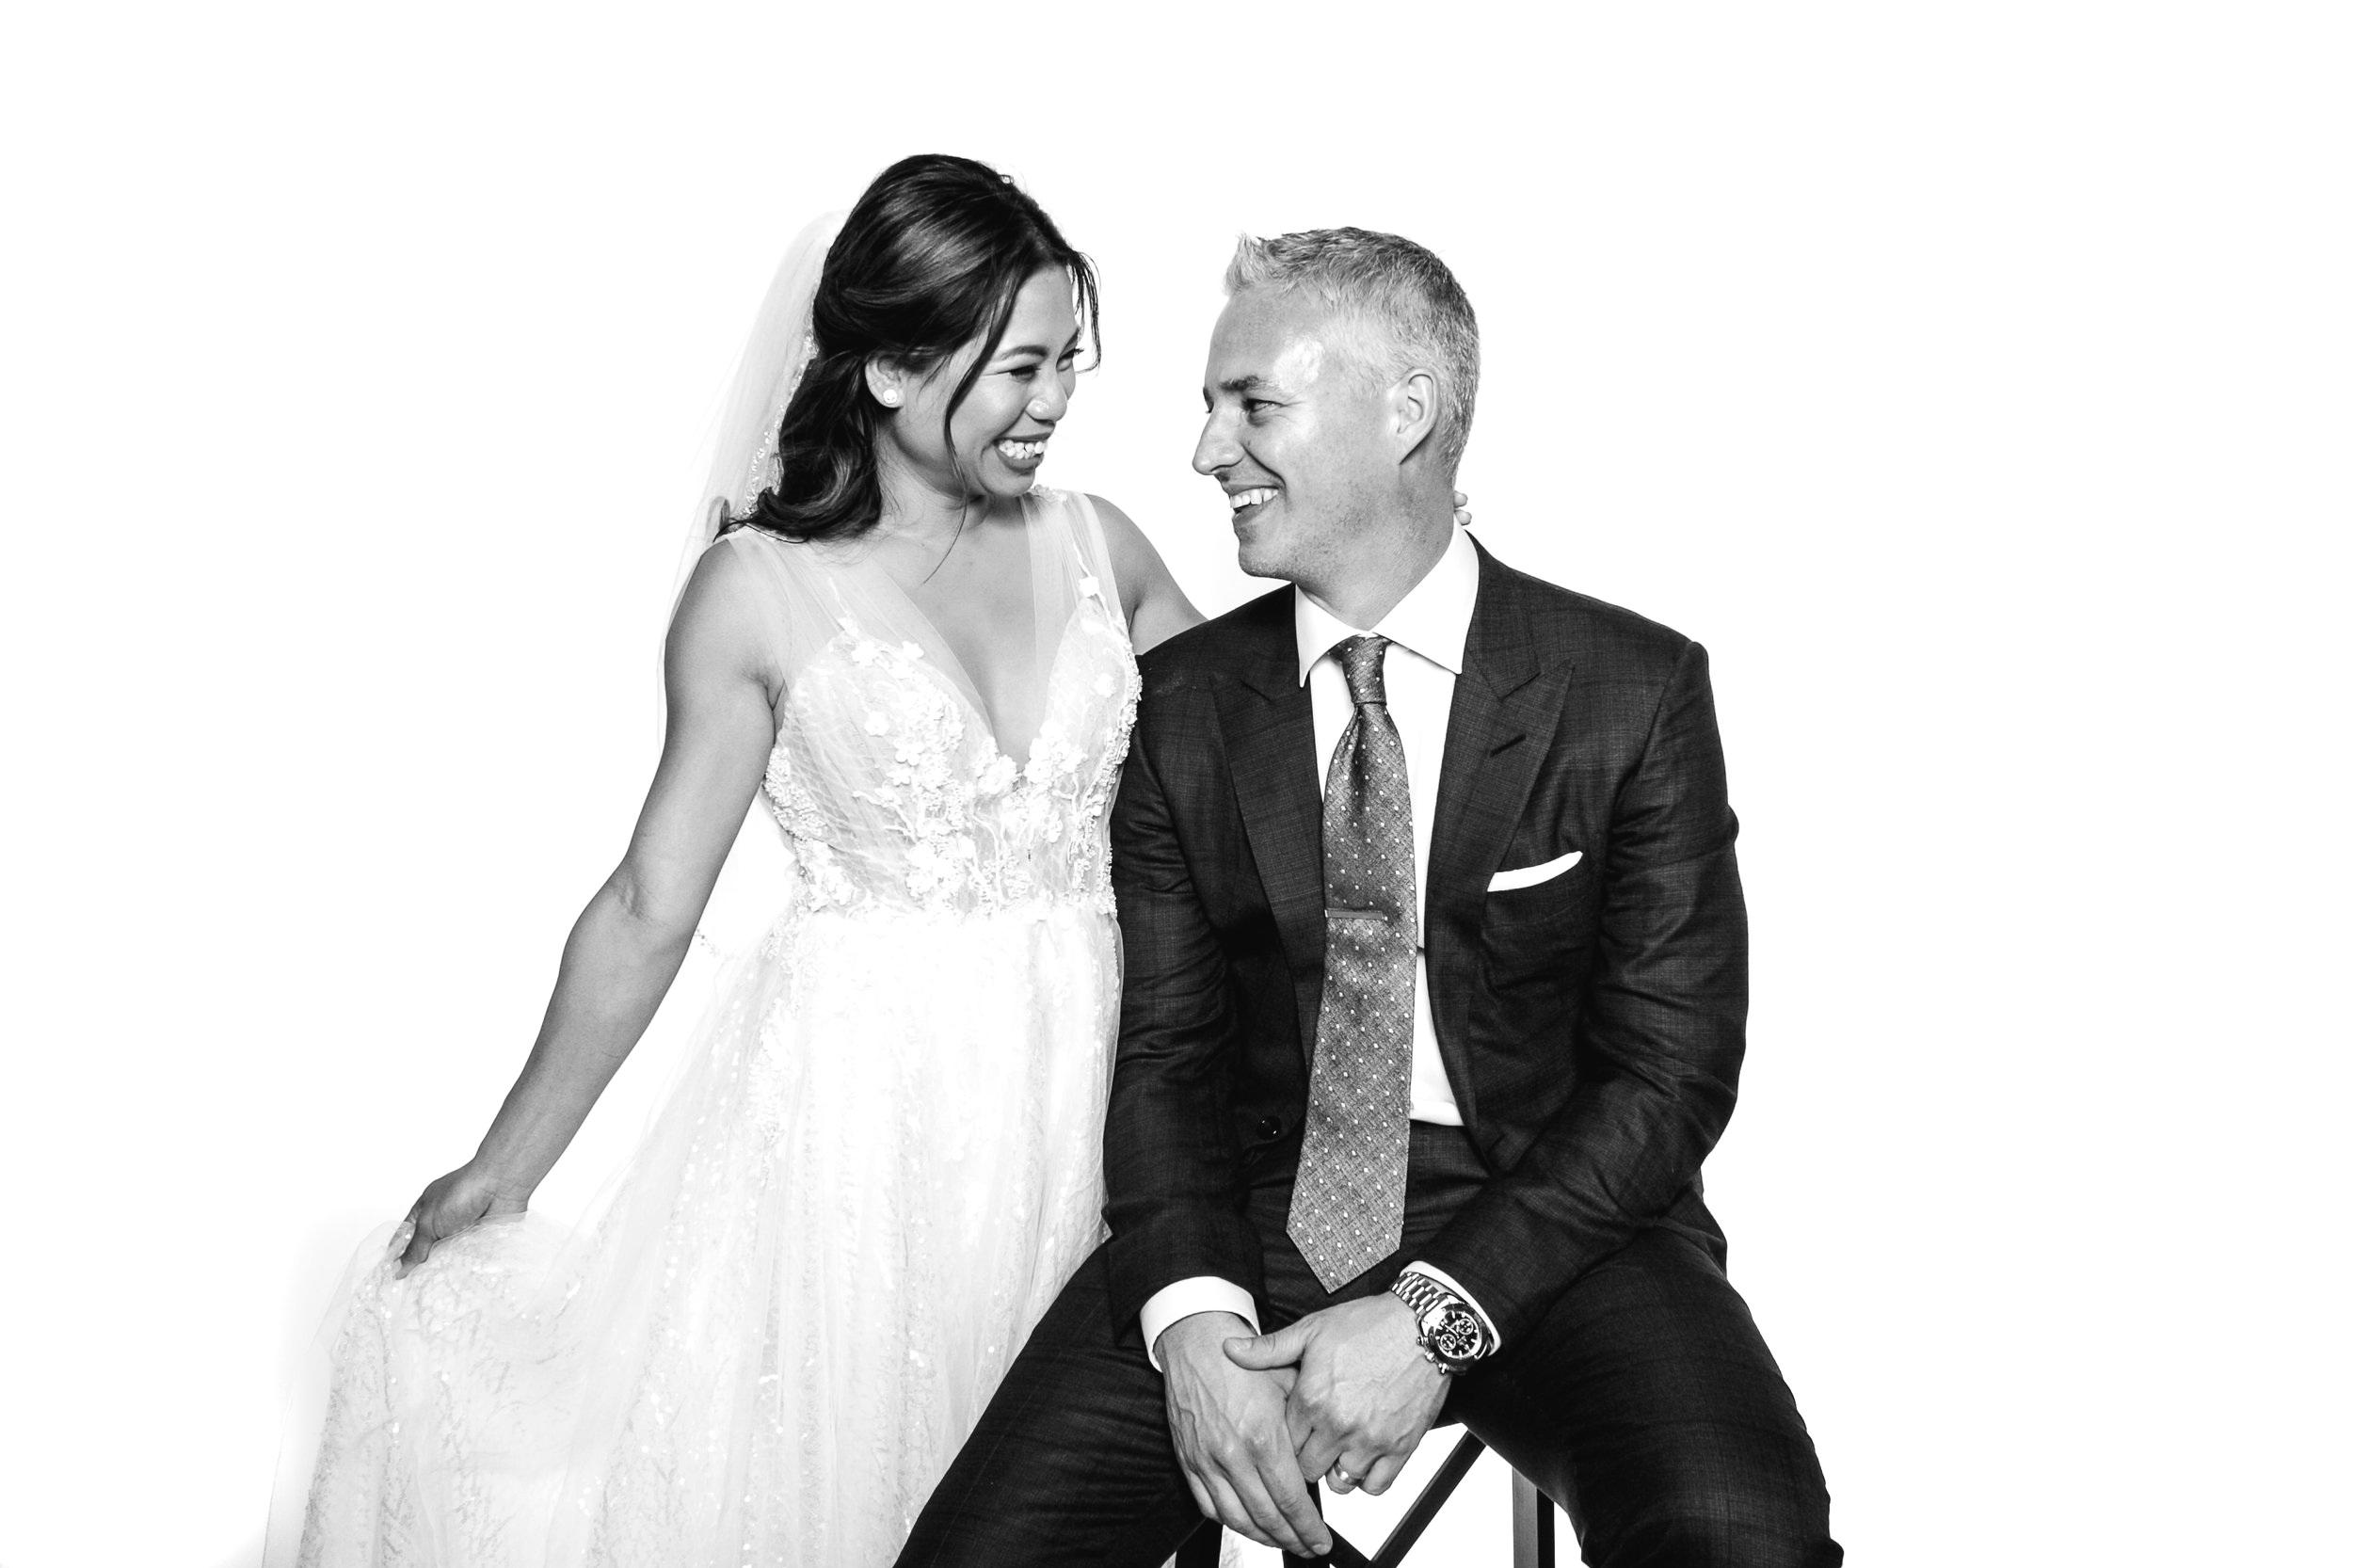 banff+wedding+photo+booth.jpg